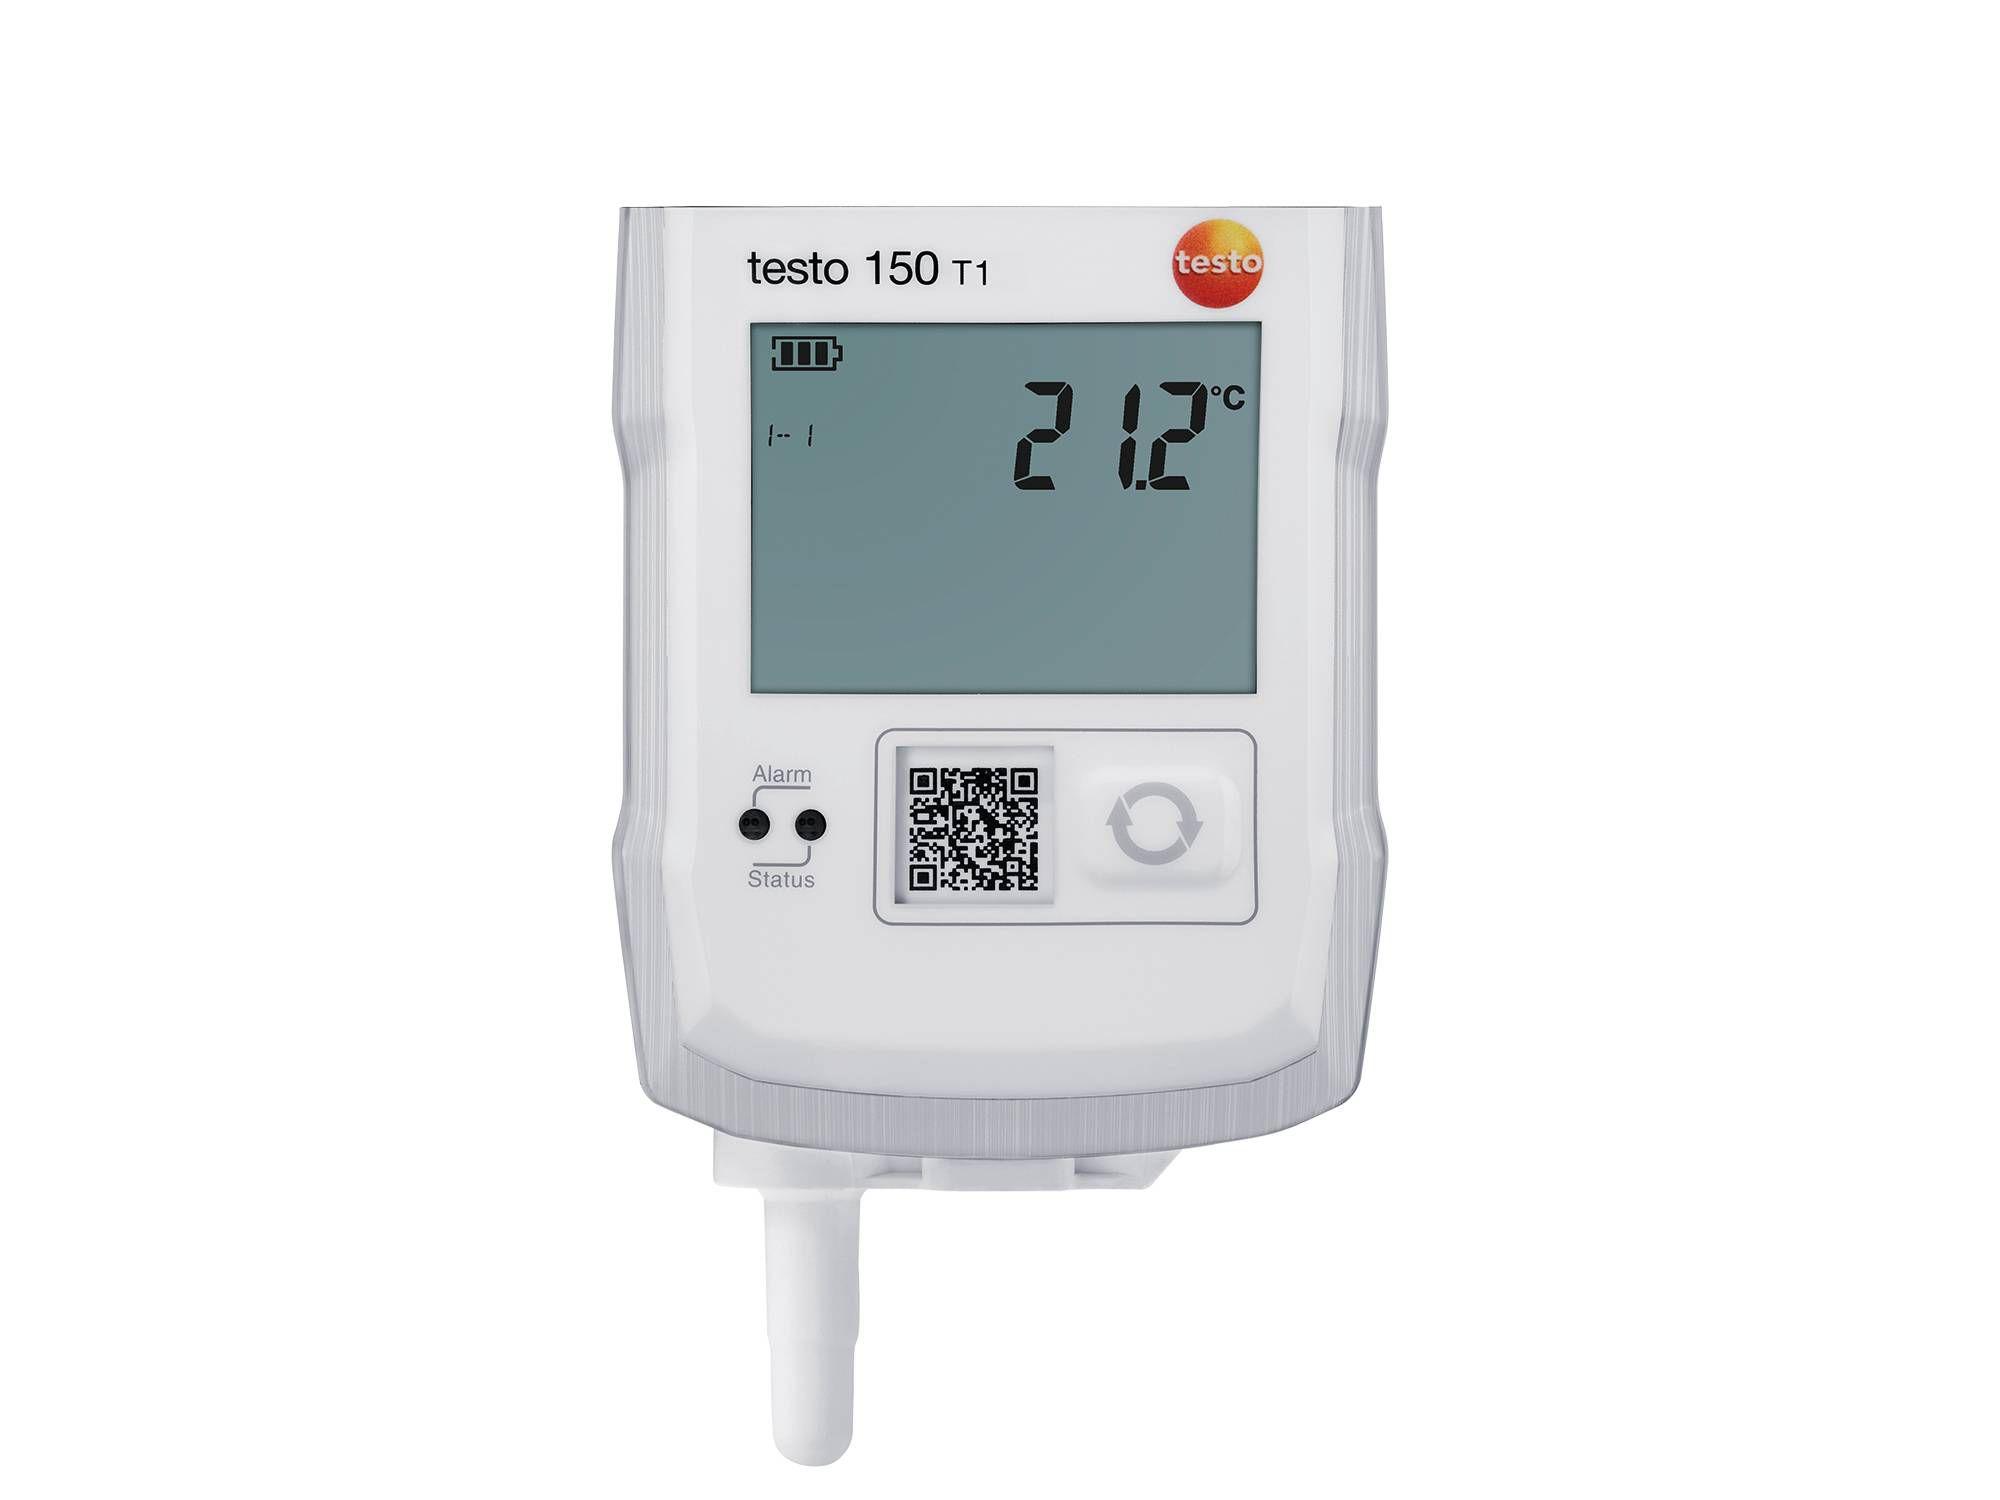 testo 150 T1 数据记录仪模块